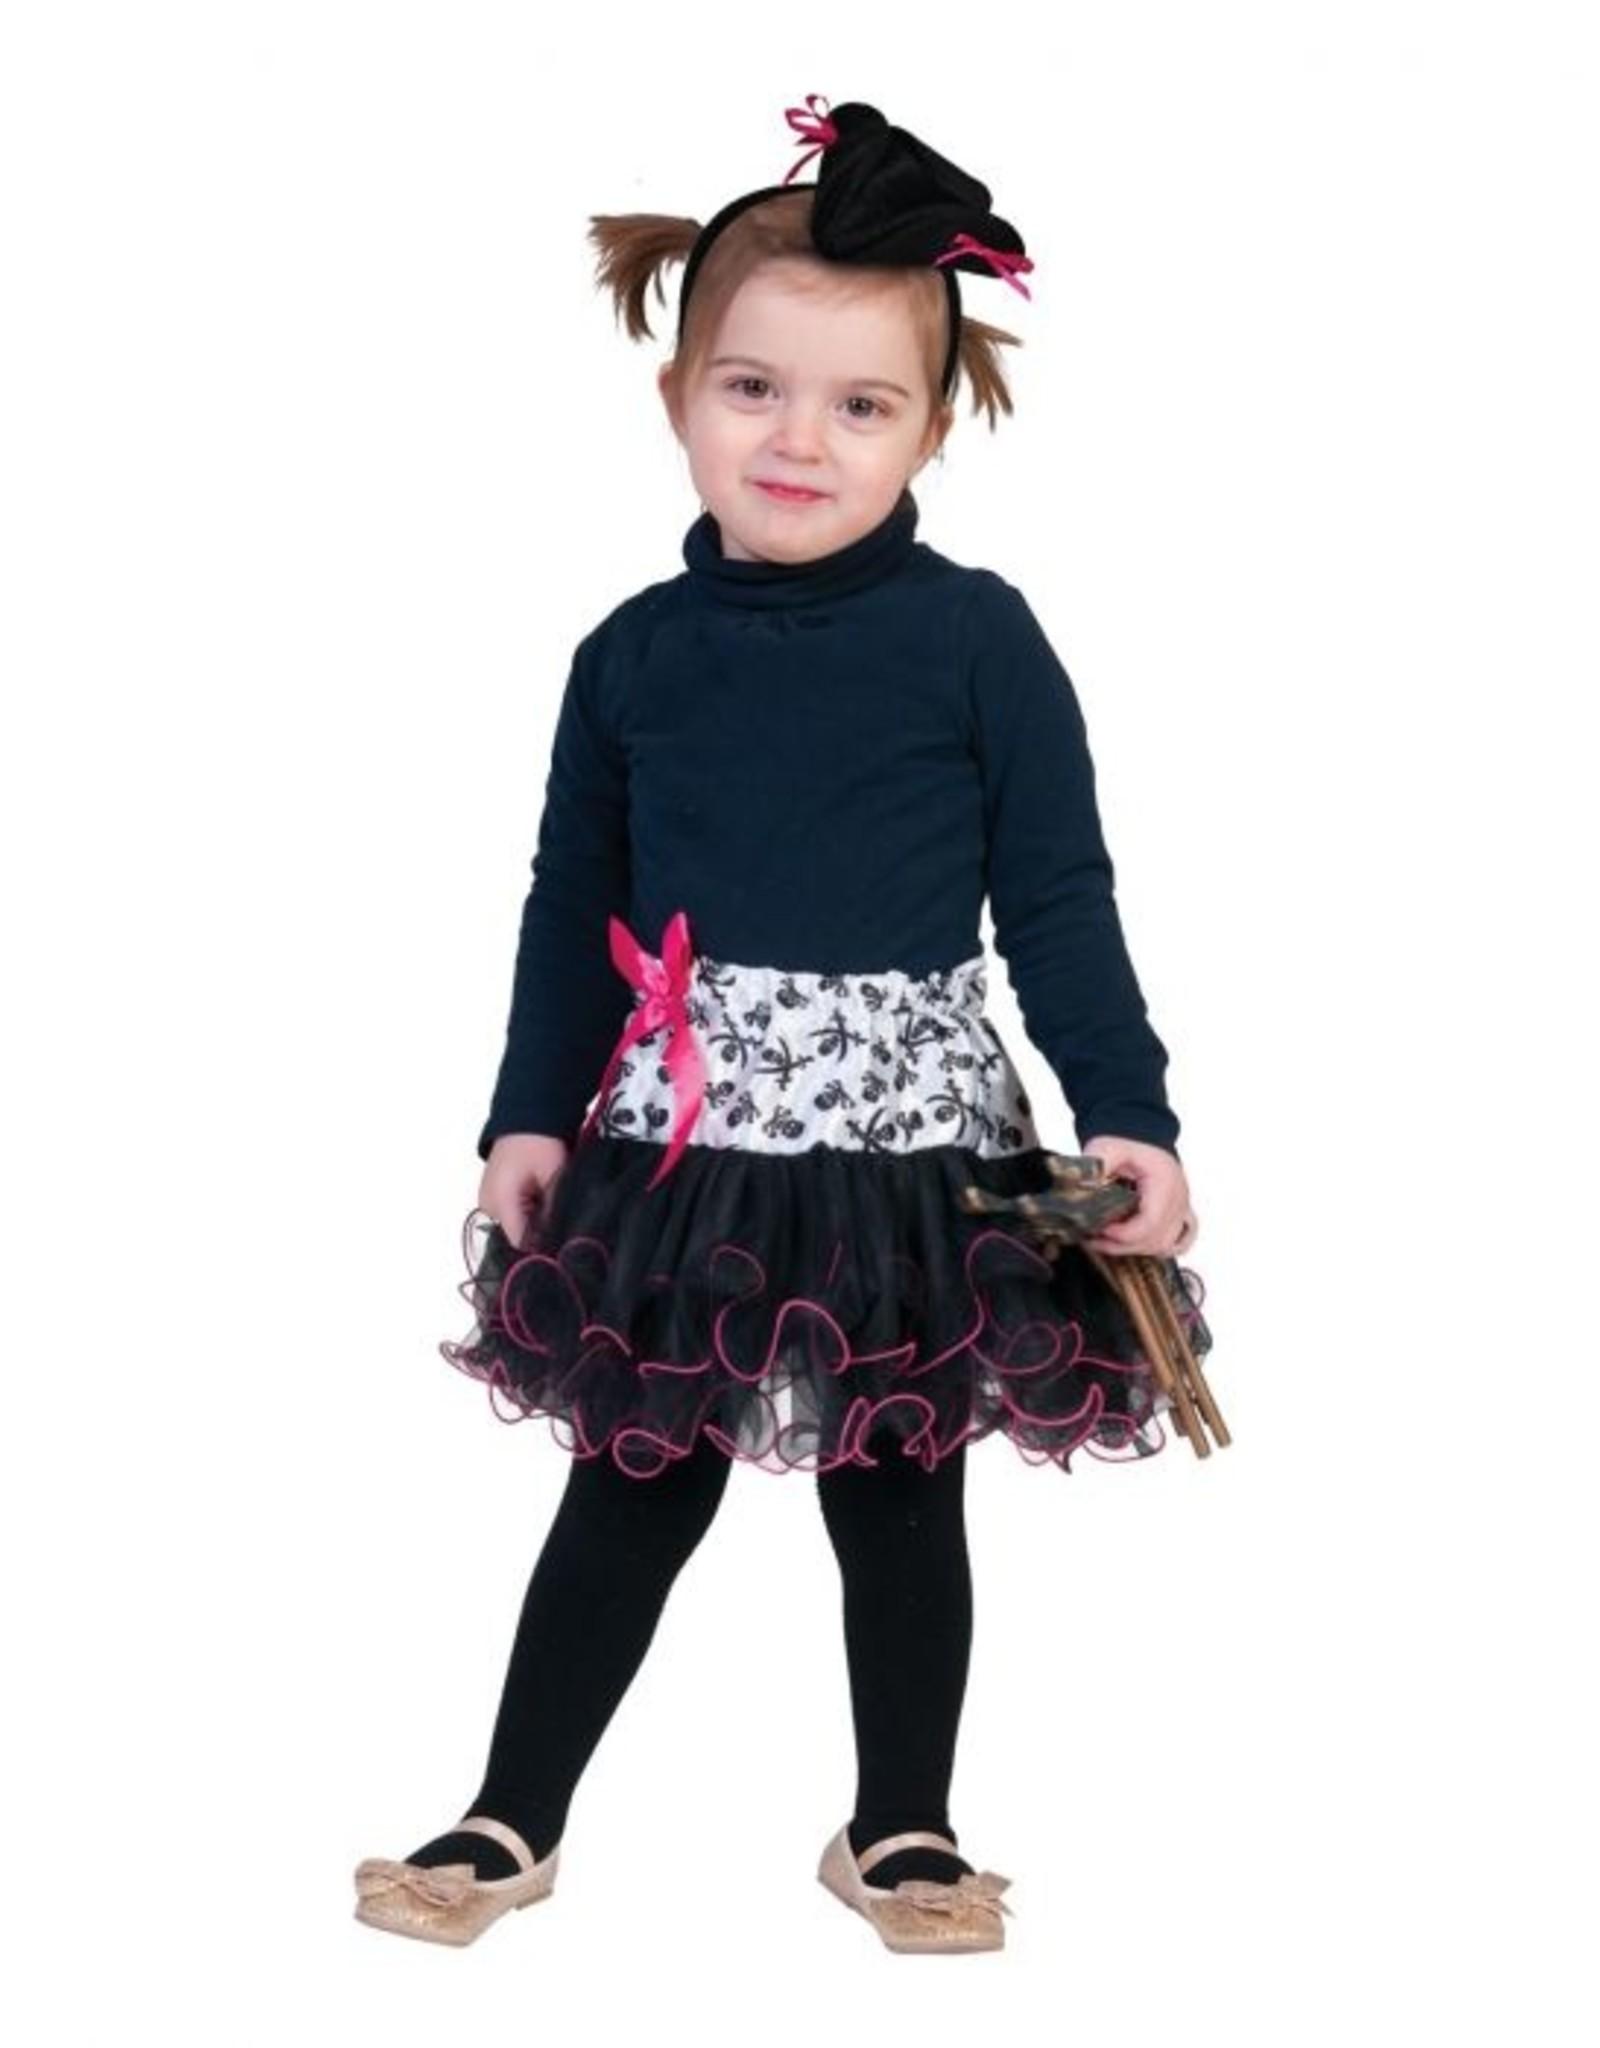 Funny Fashion Piraten rok kostuum kind baby